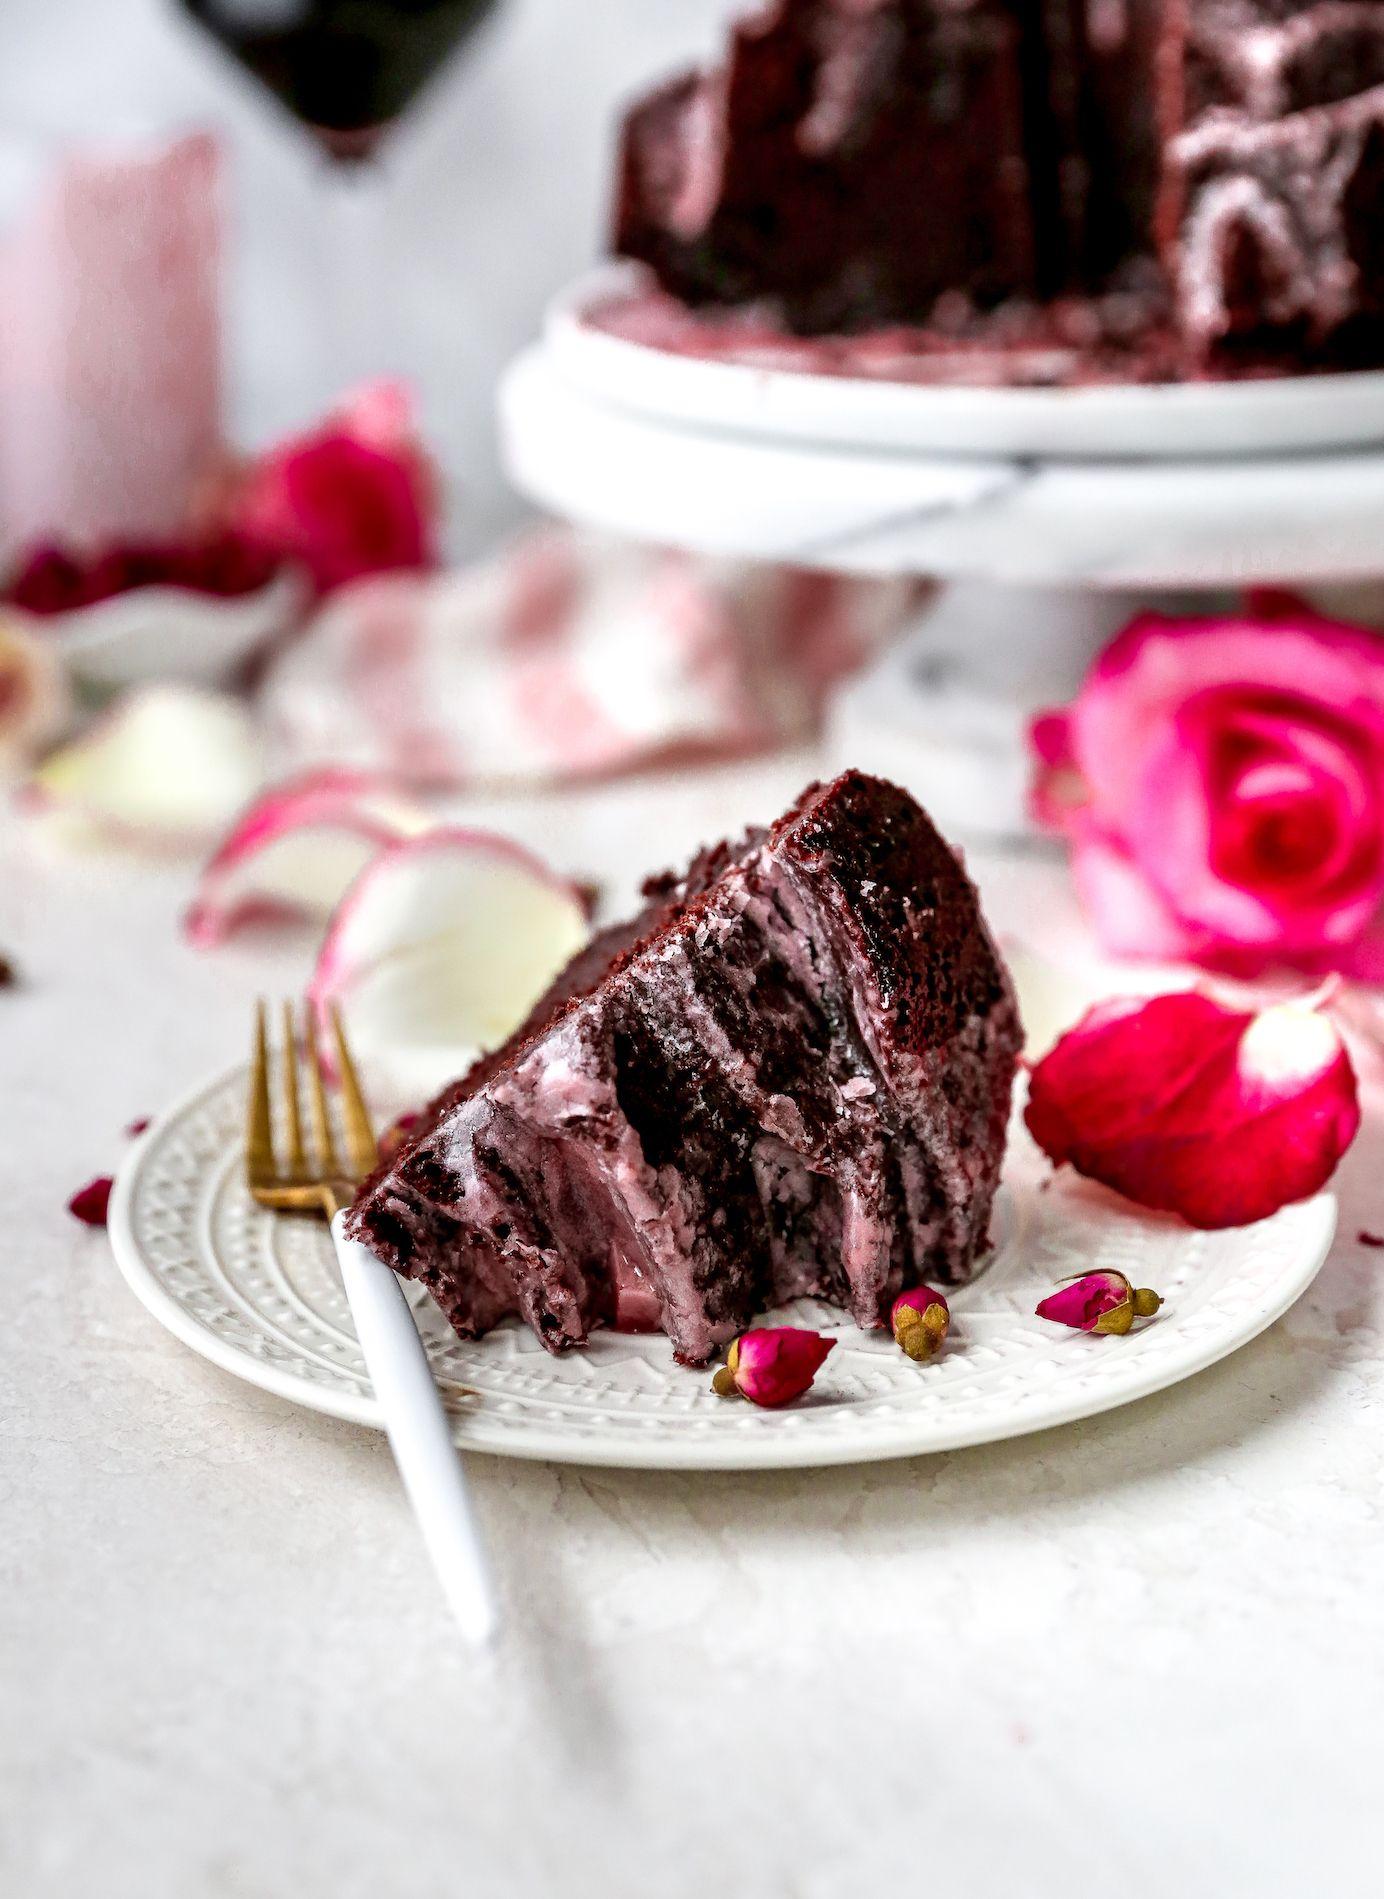 Chocolate cake with red wine glaze in 2020 wine